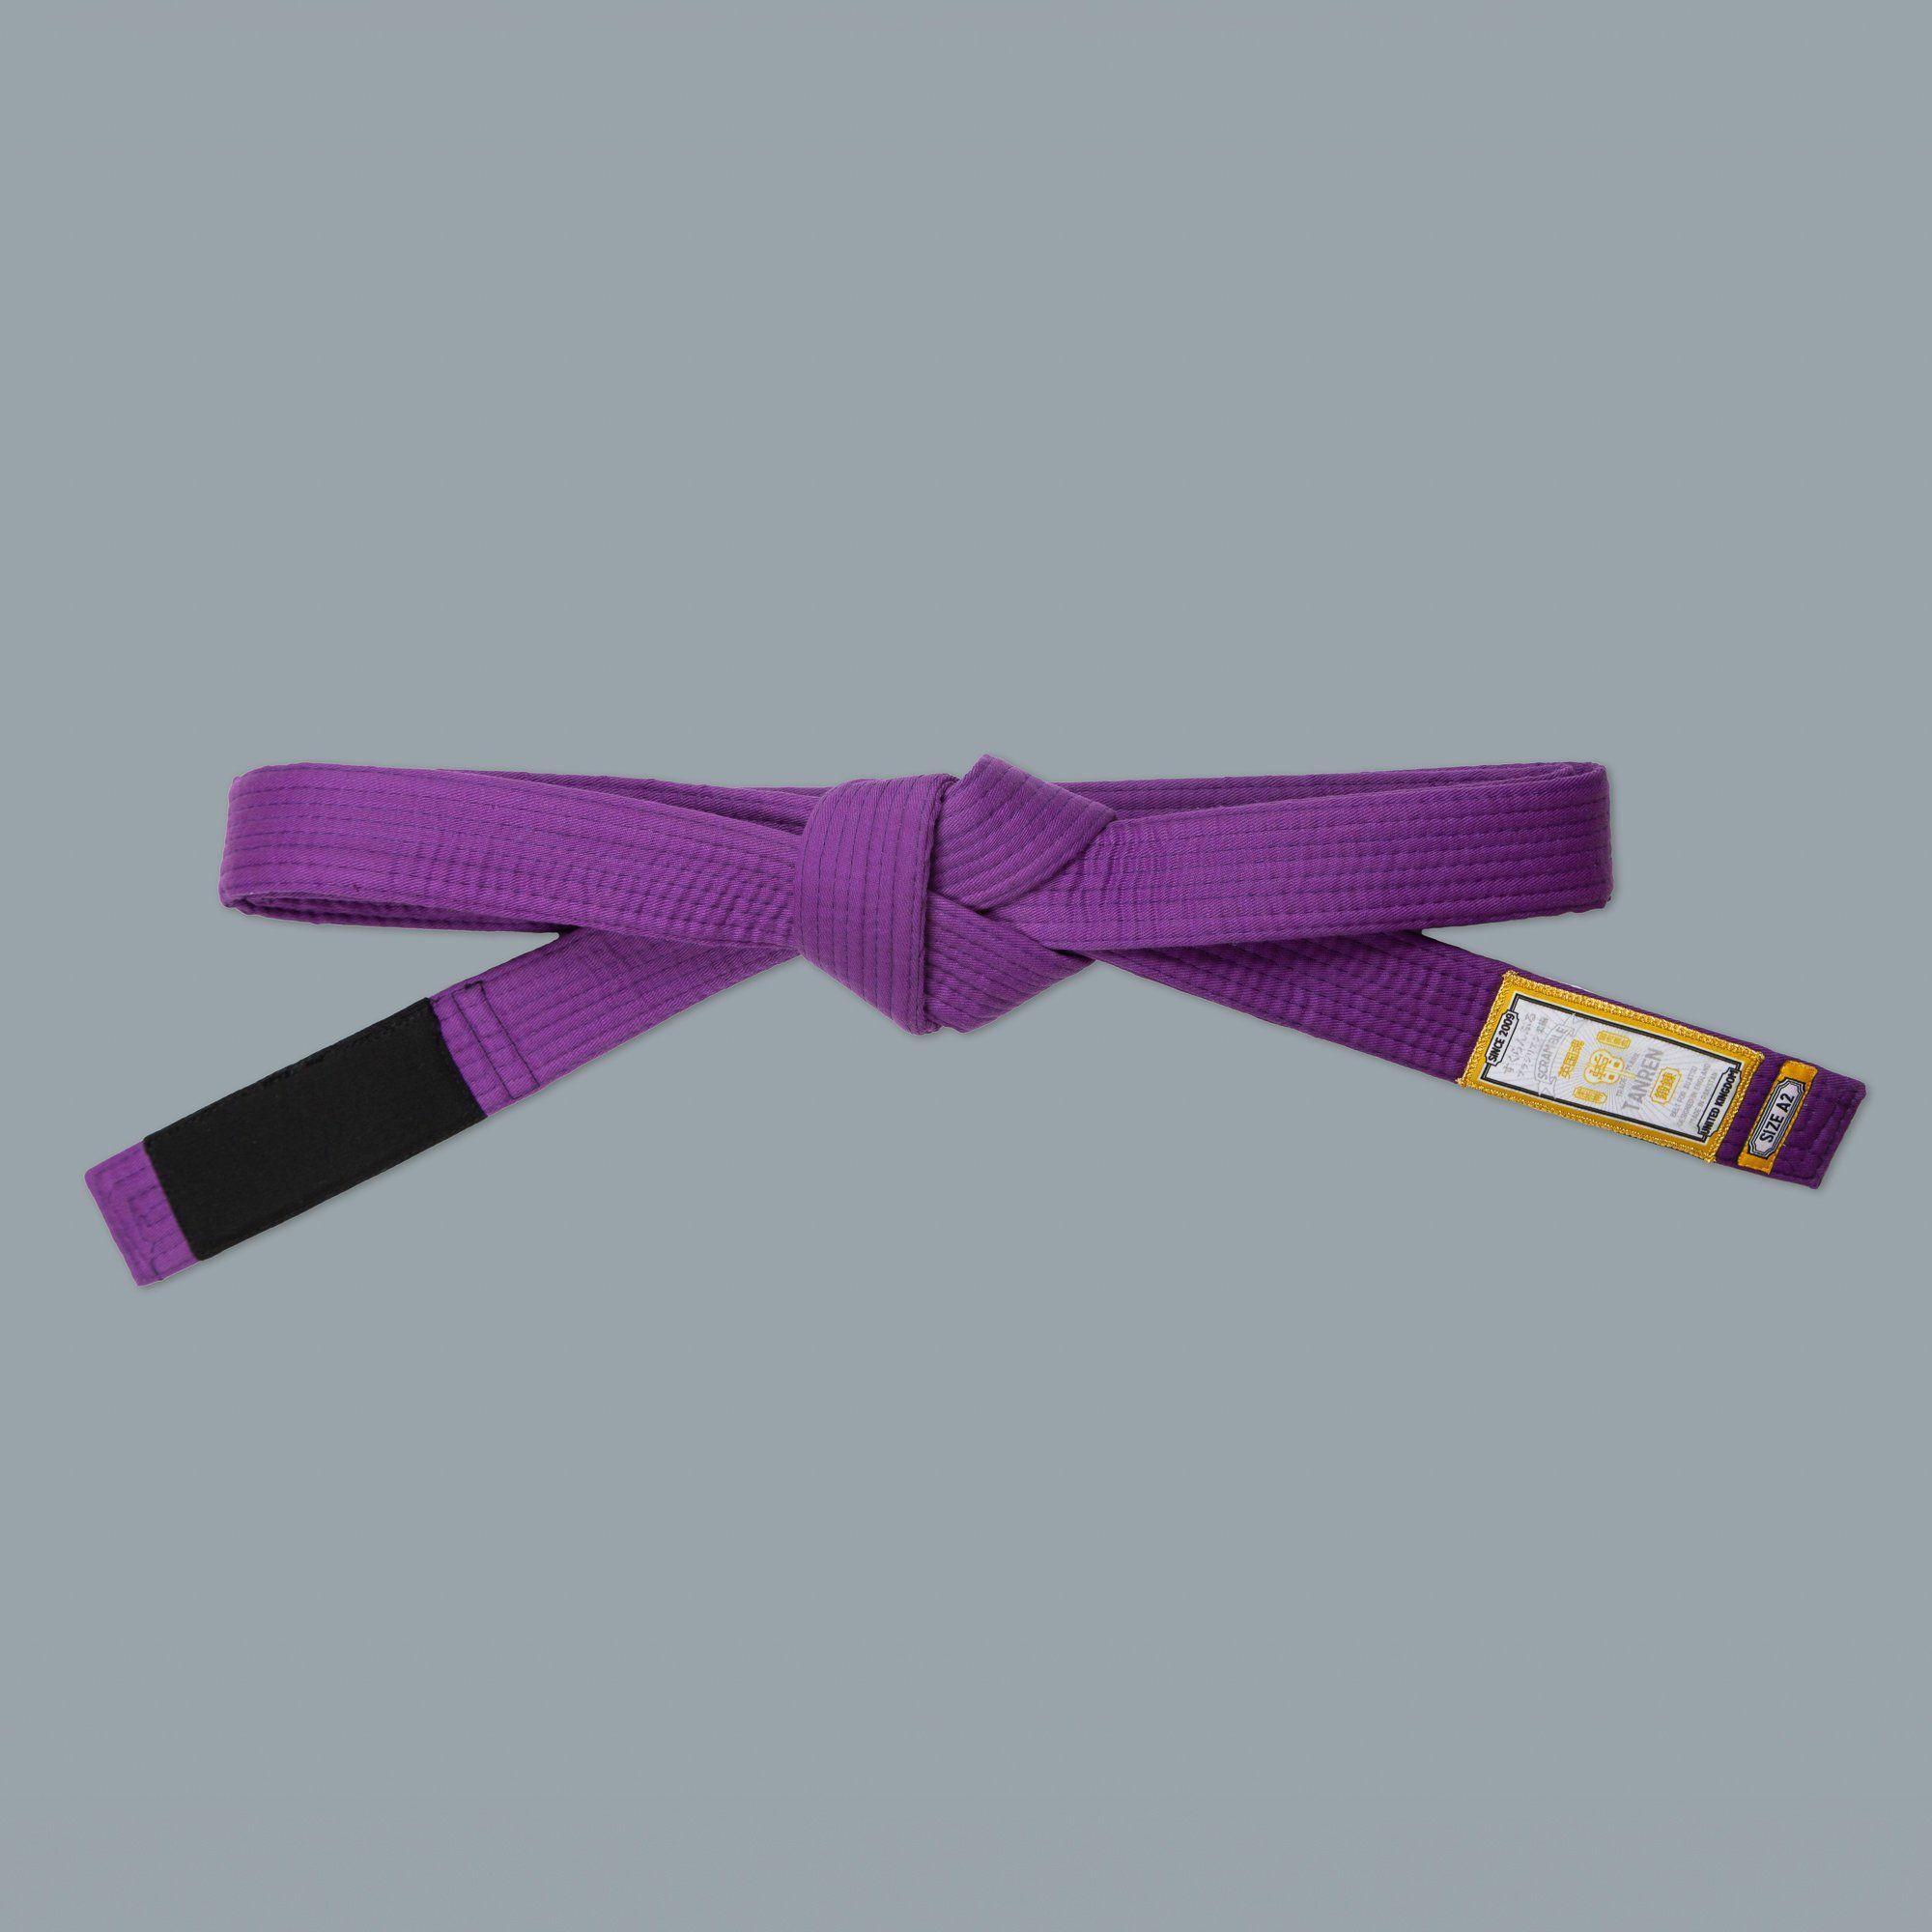 SCRAMBLE ブラジリアン柔術帯 TANREN V4 紫帯